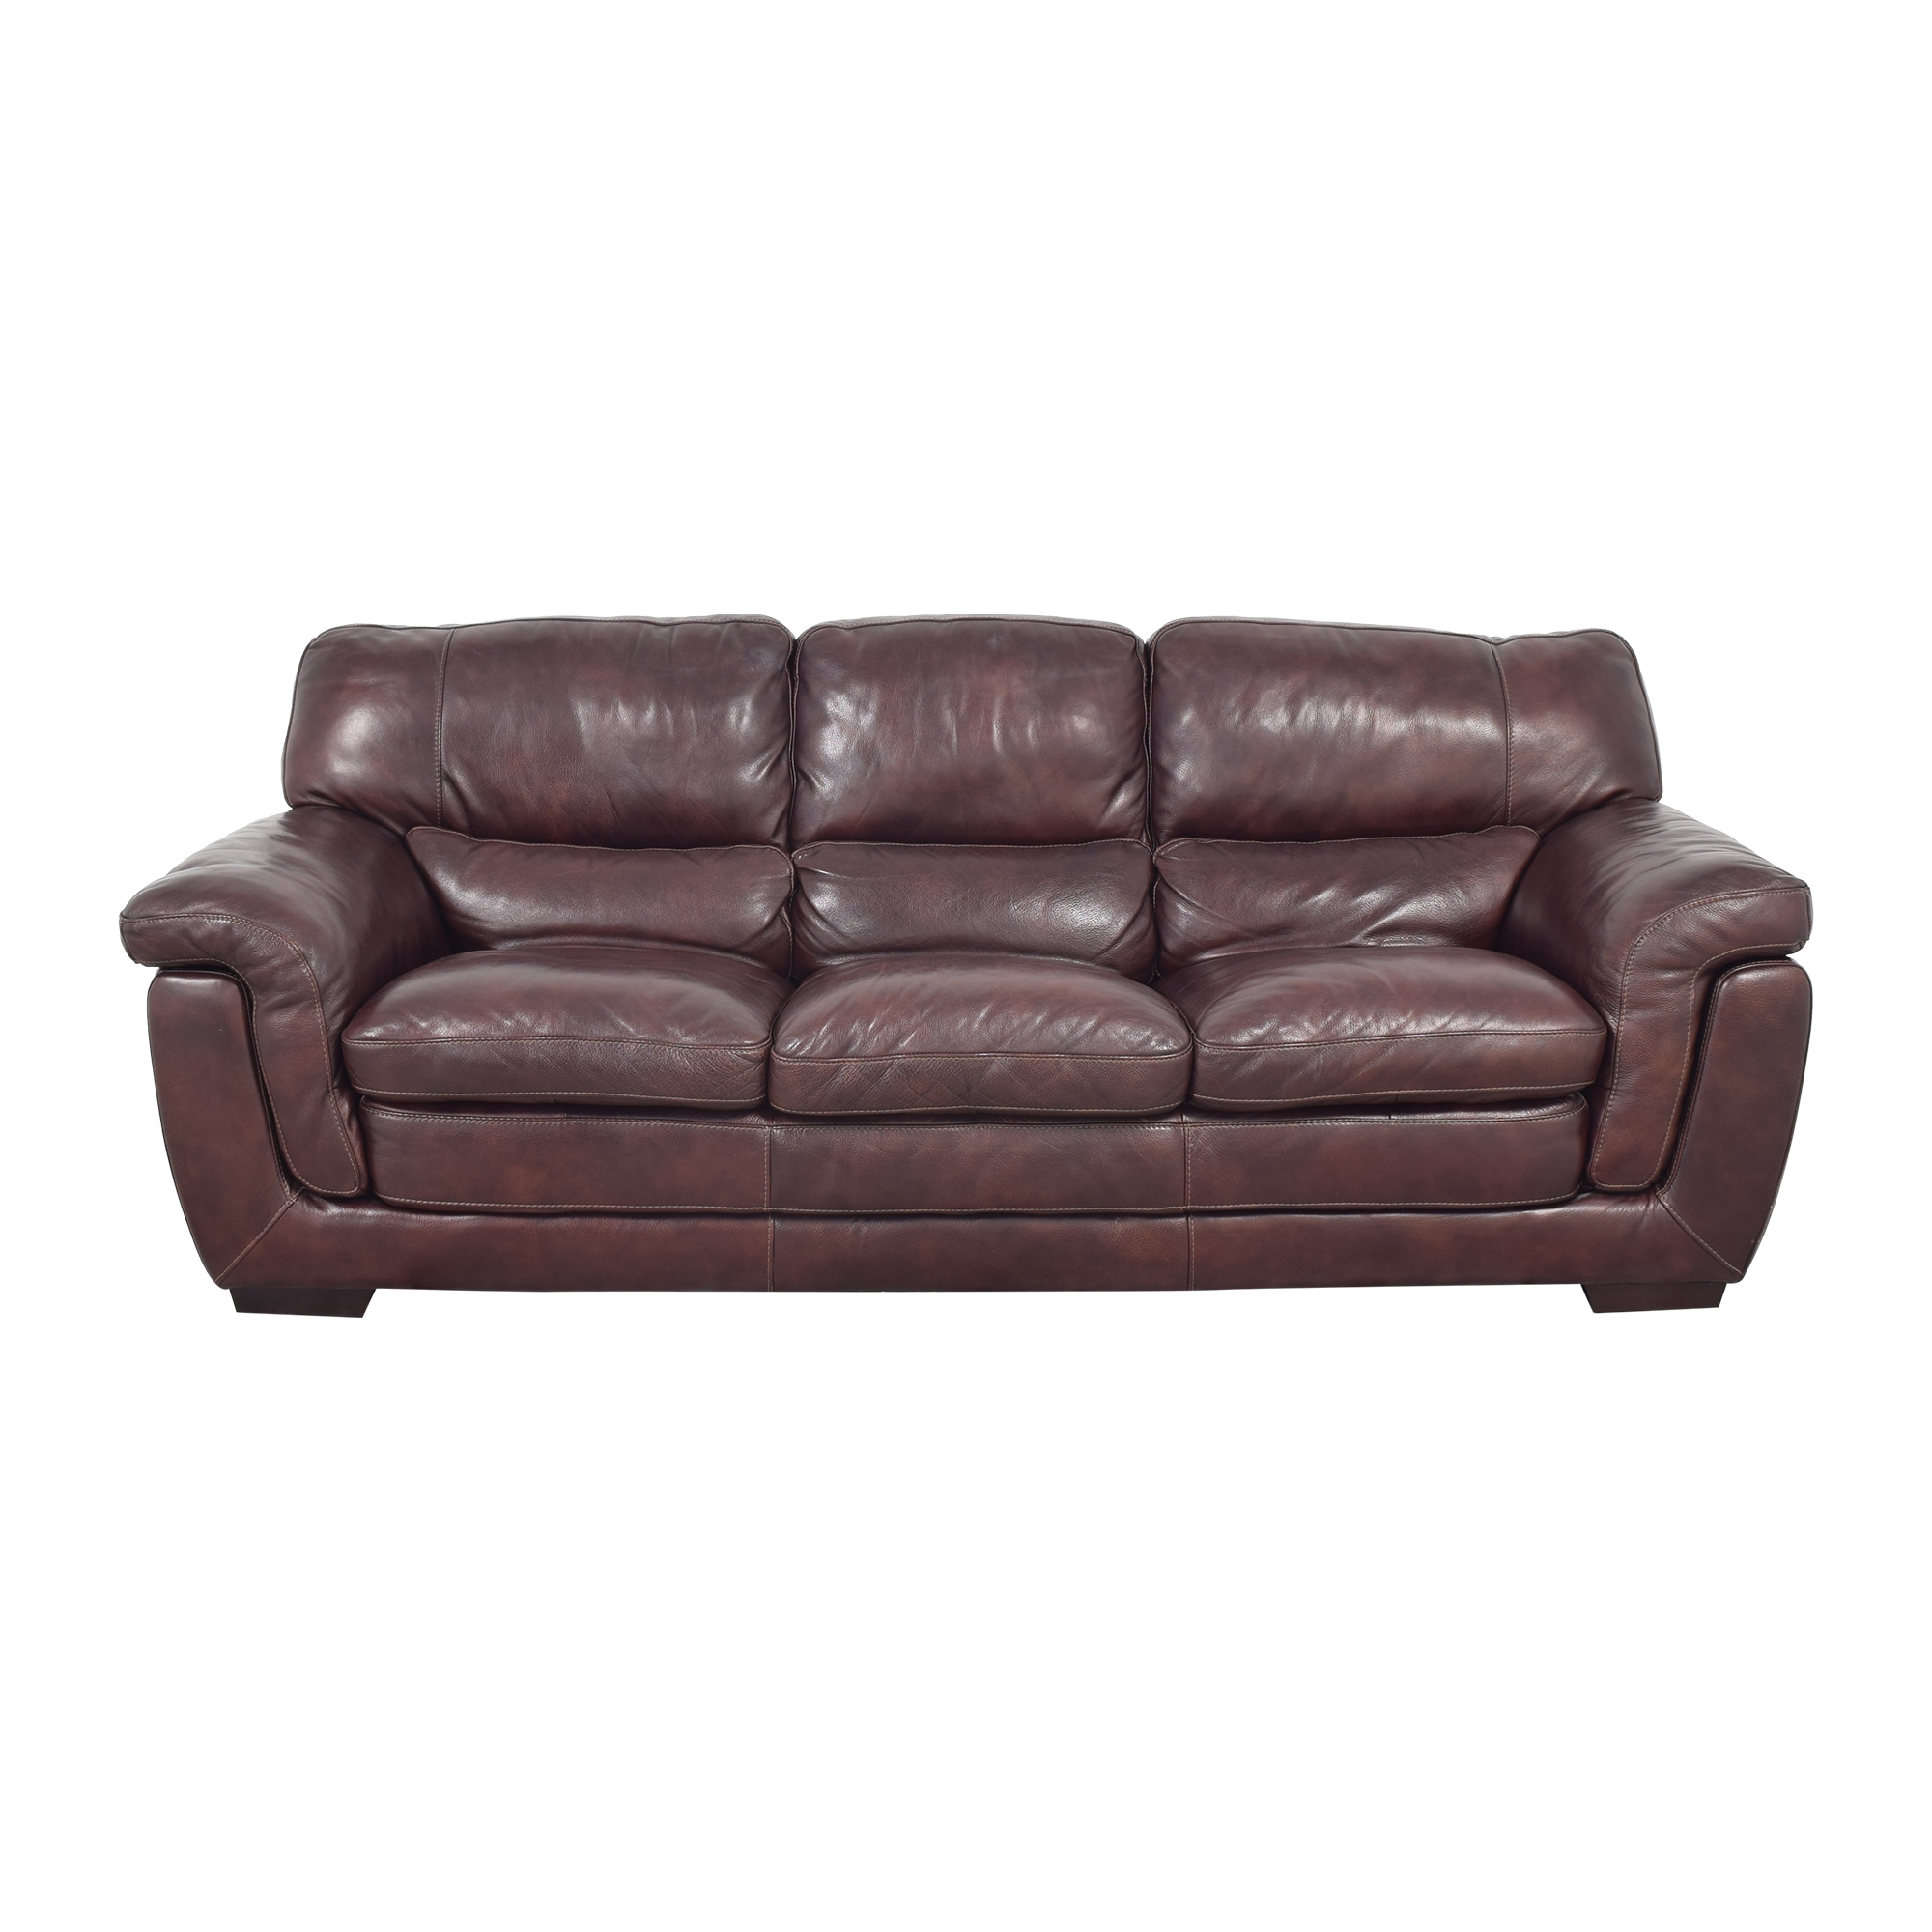 Raymour & Flanigan Raymour & Flanigan Pub-Back Sofa discount